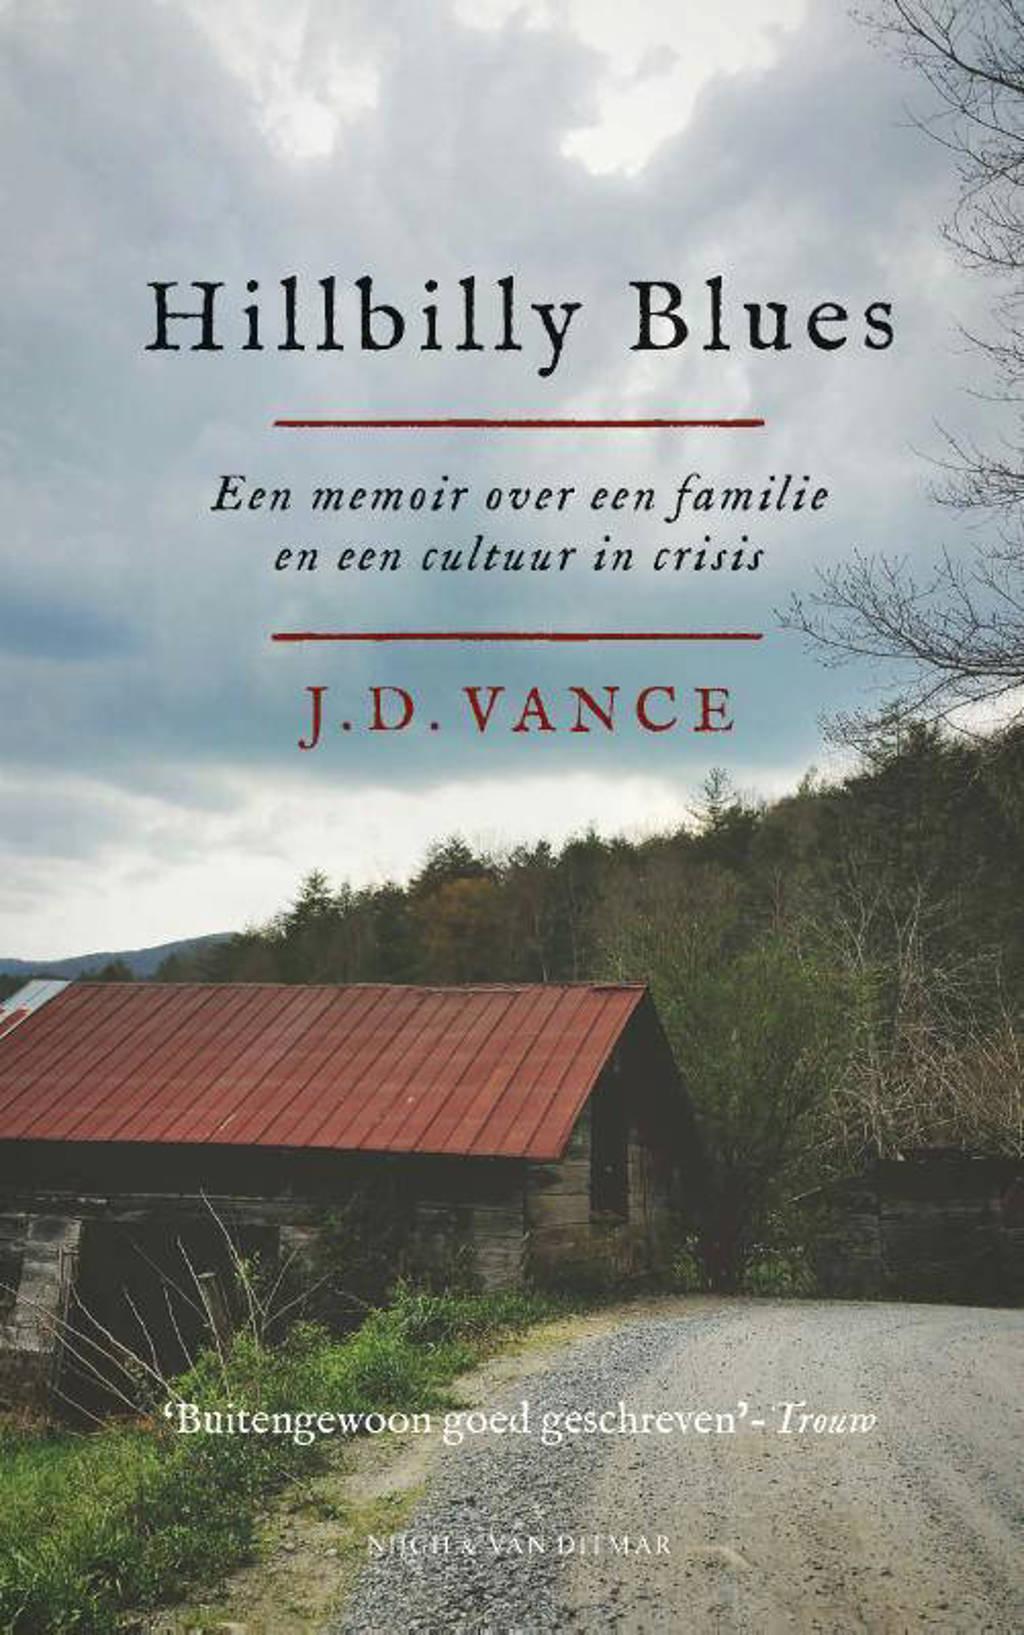 Hillbilly Blues - J.D. Vance